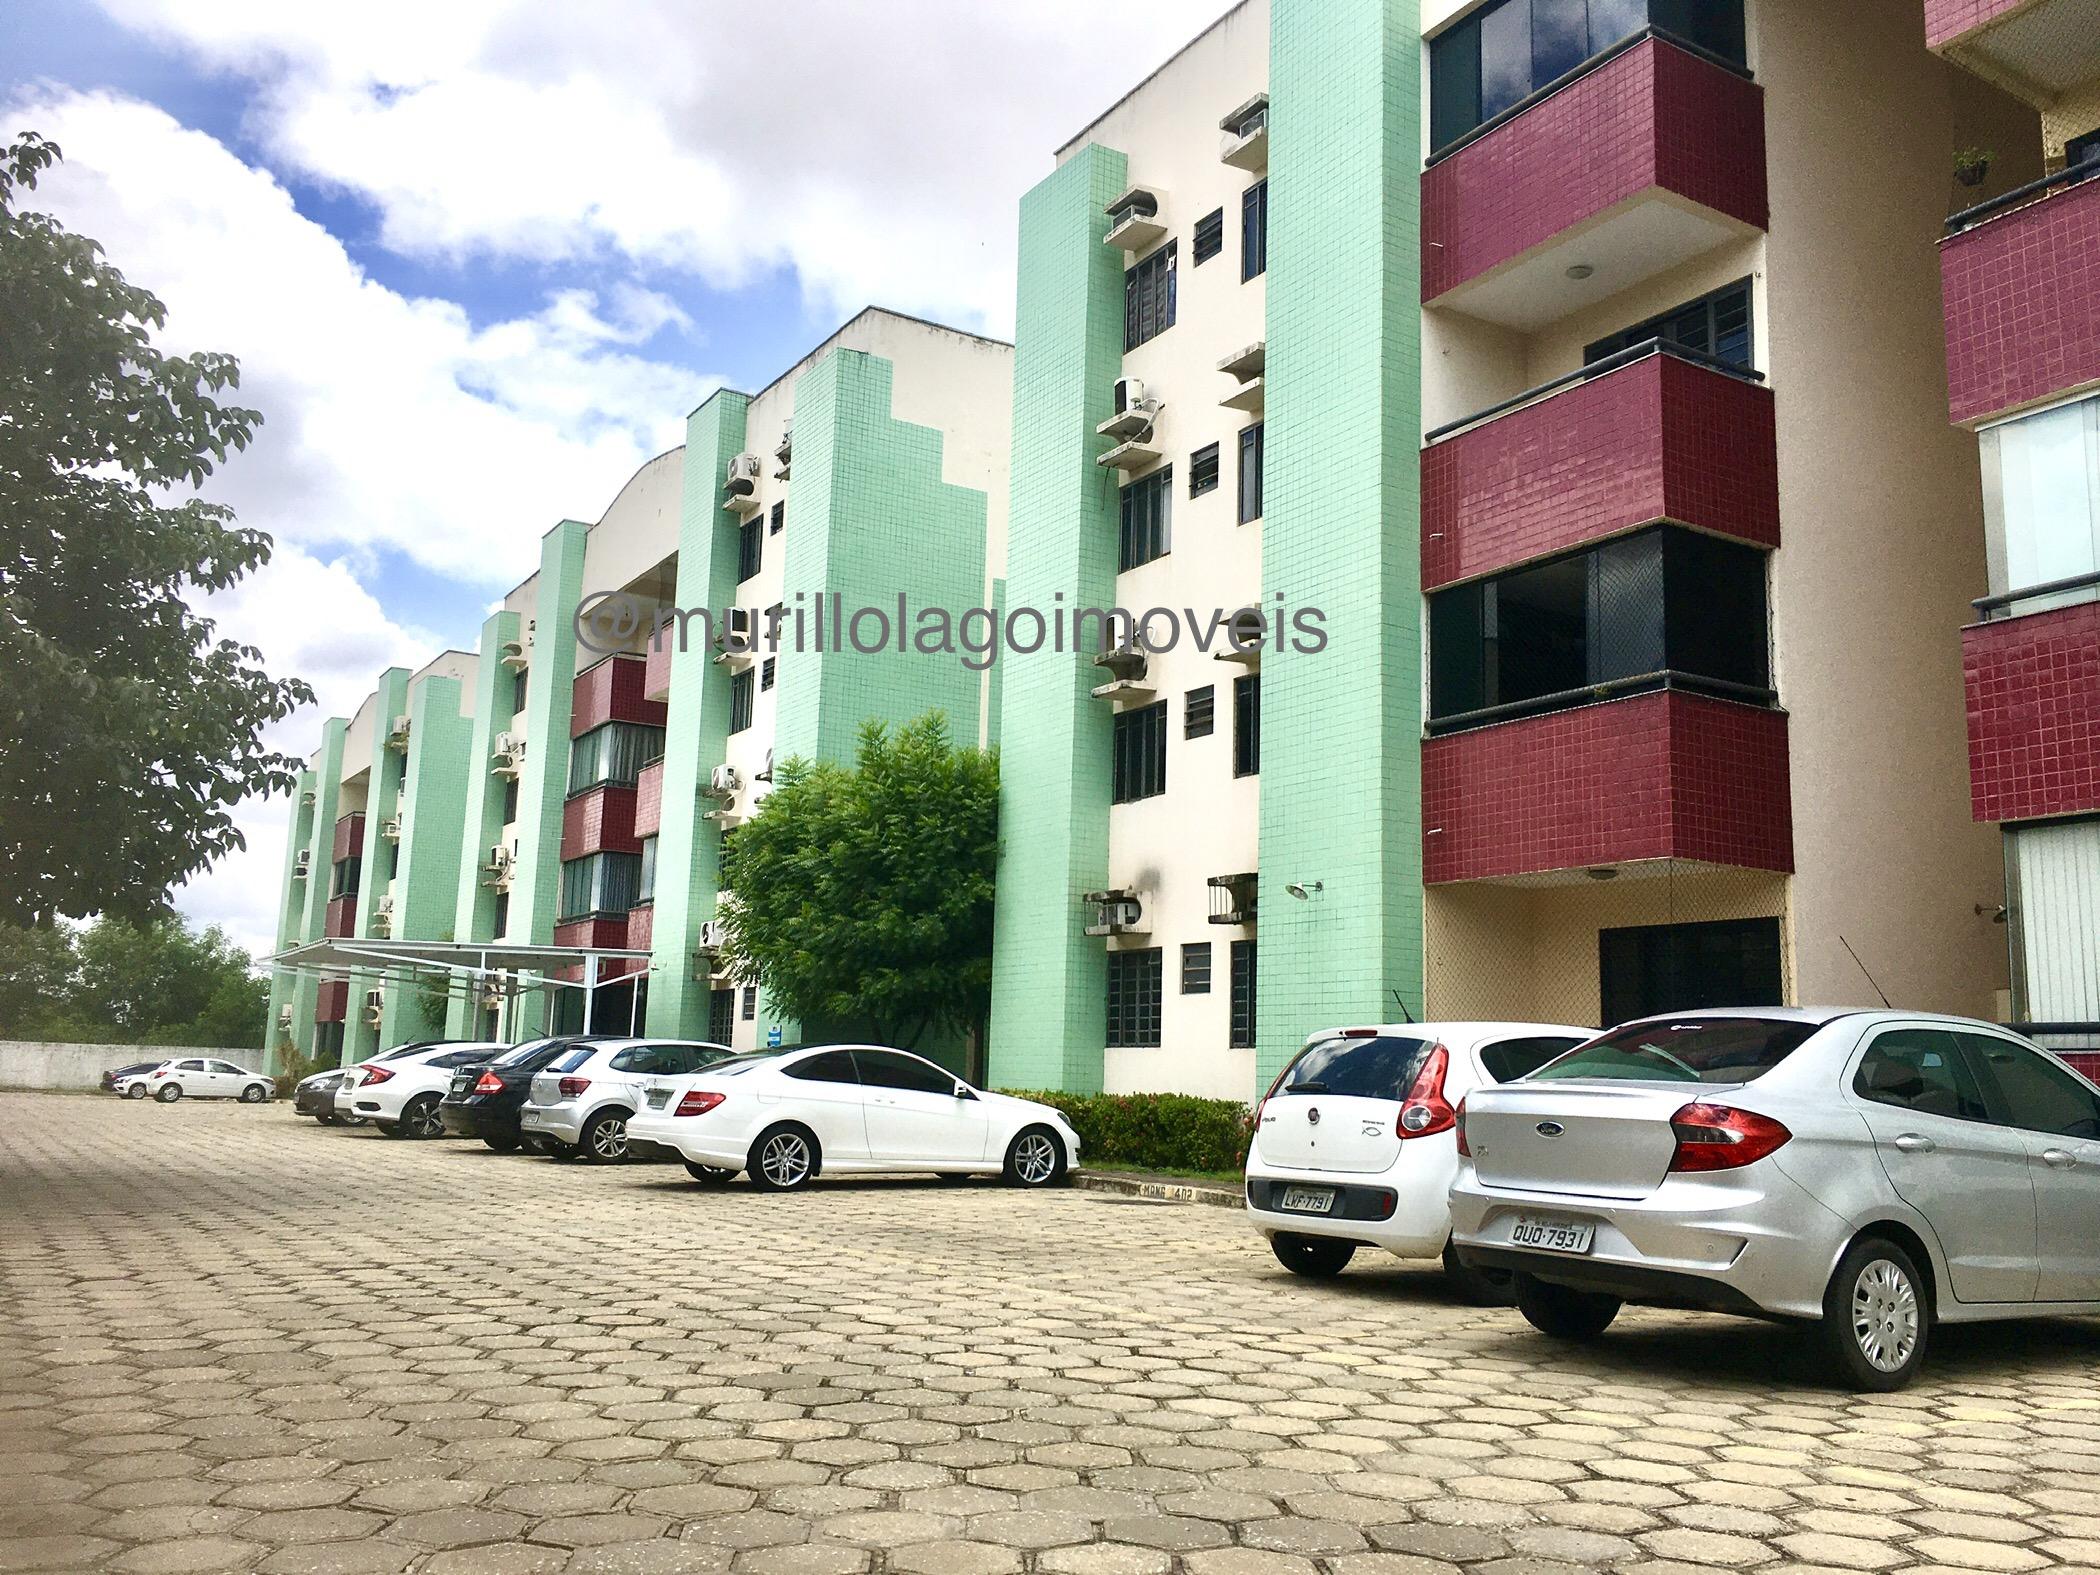 Apartamento à venda no condomínio Delta do Parnaíba no térreo, 3 quartos sendo 2 suítes.